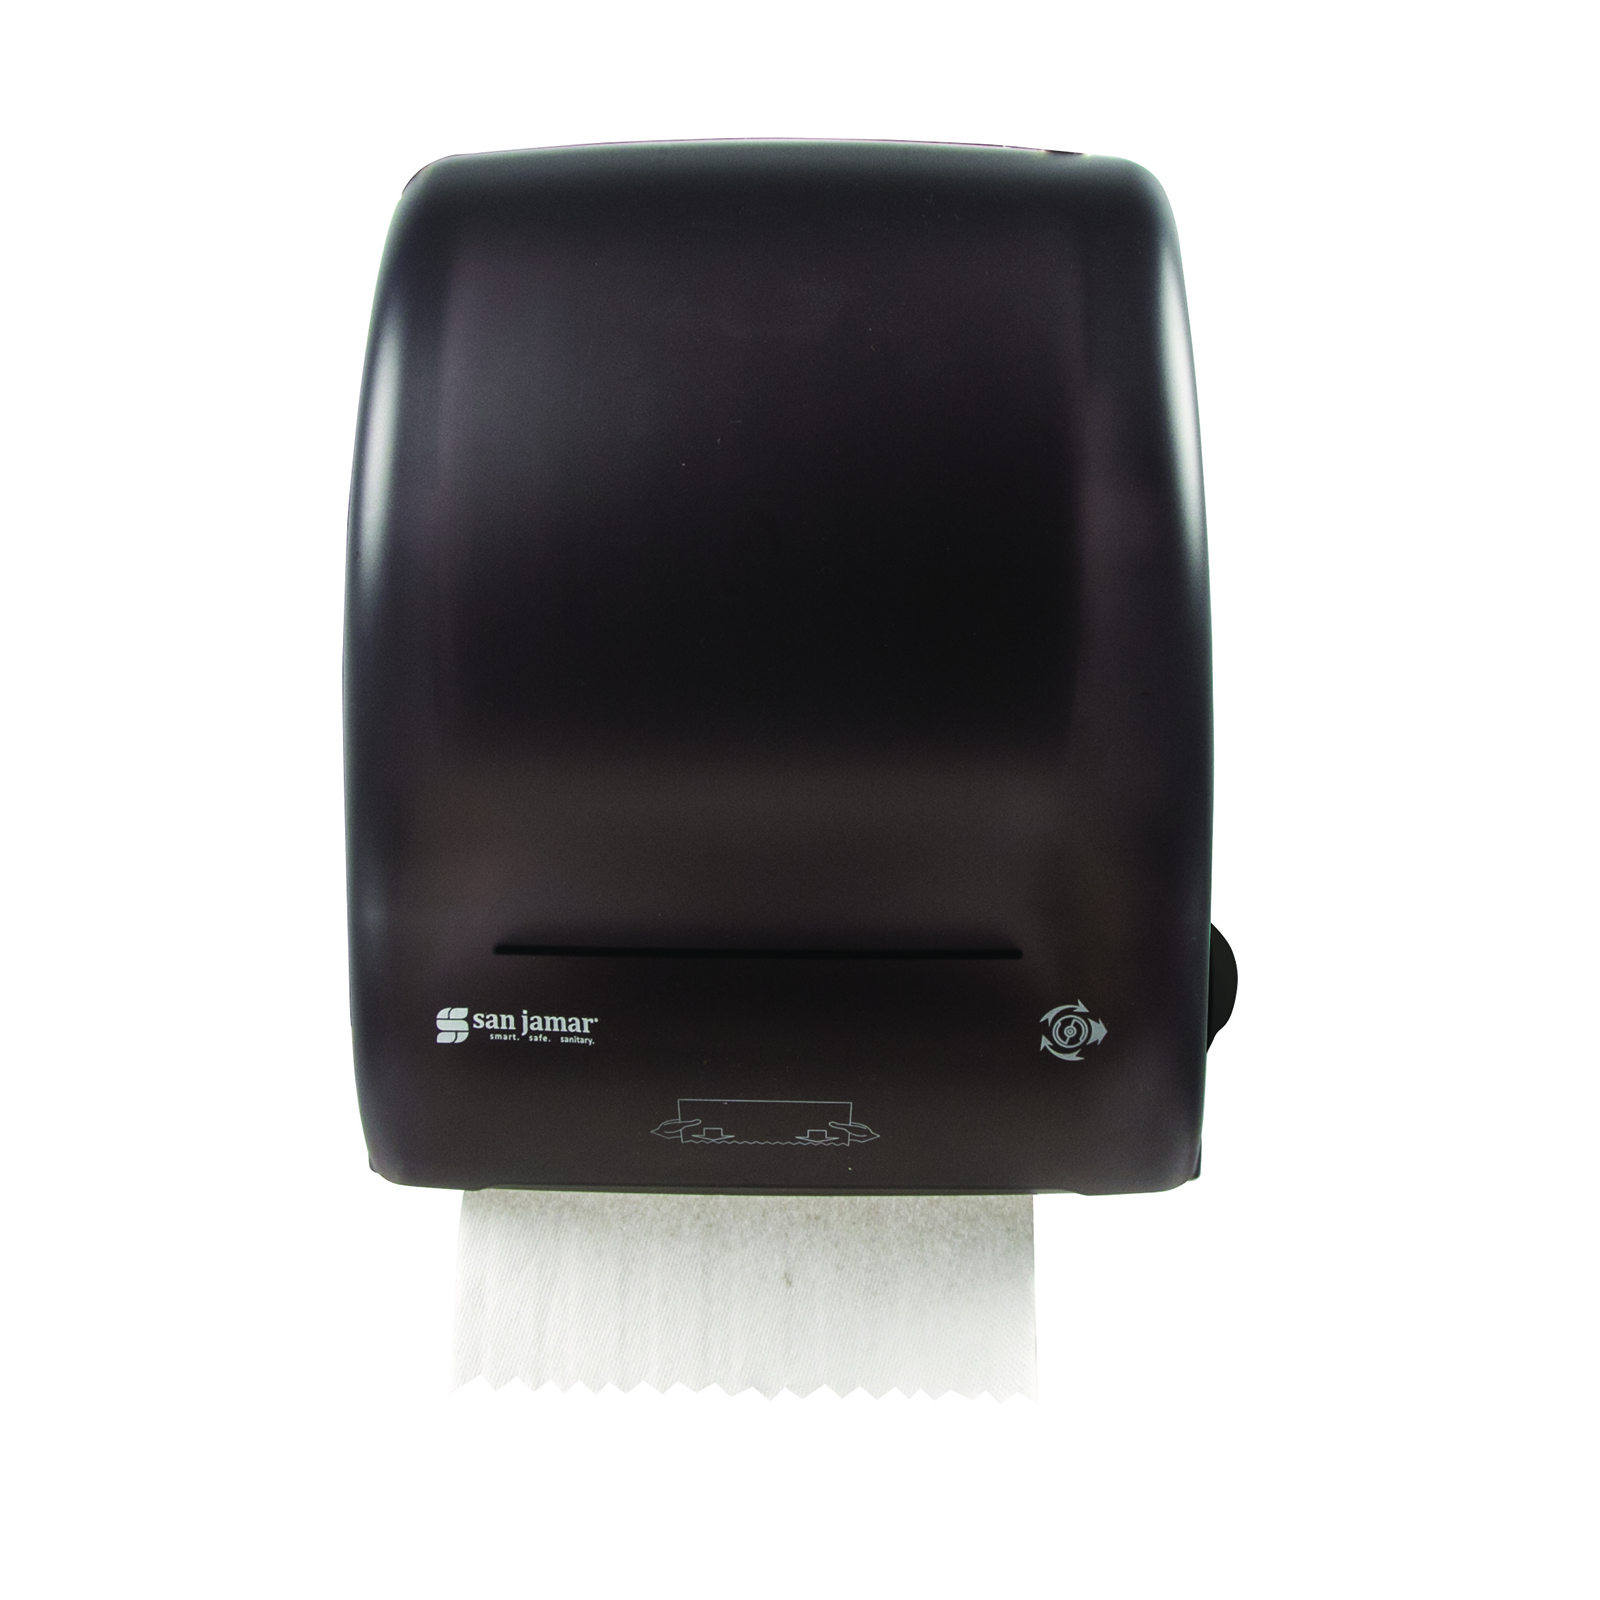 San Jamar T7400TBK paper towel dispenser